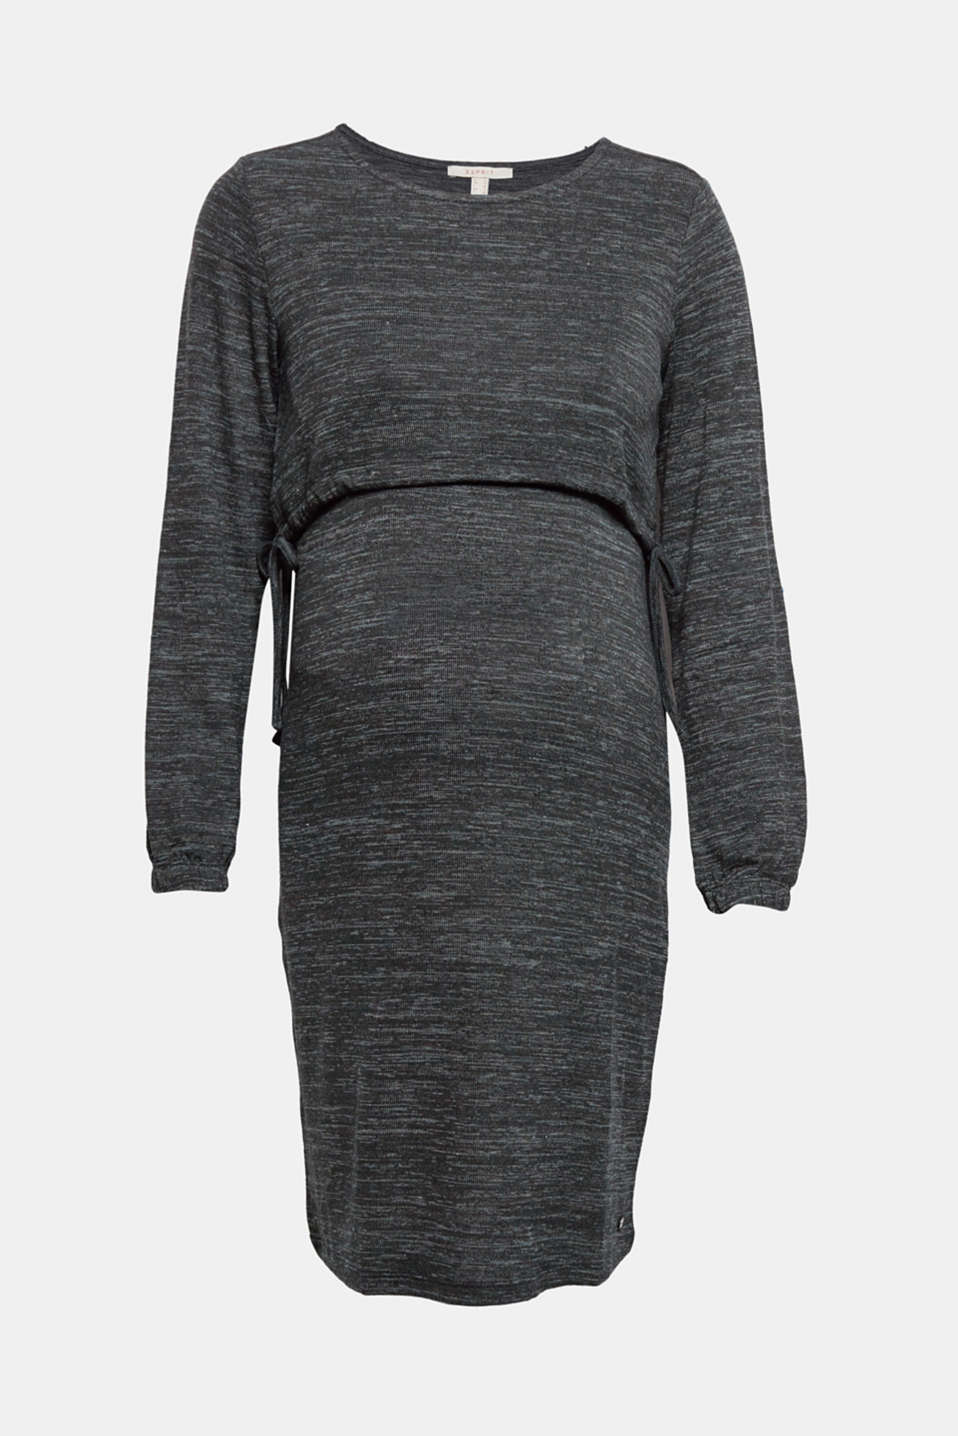 Dresses knitted, LCNAVY, detail image number 7